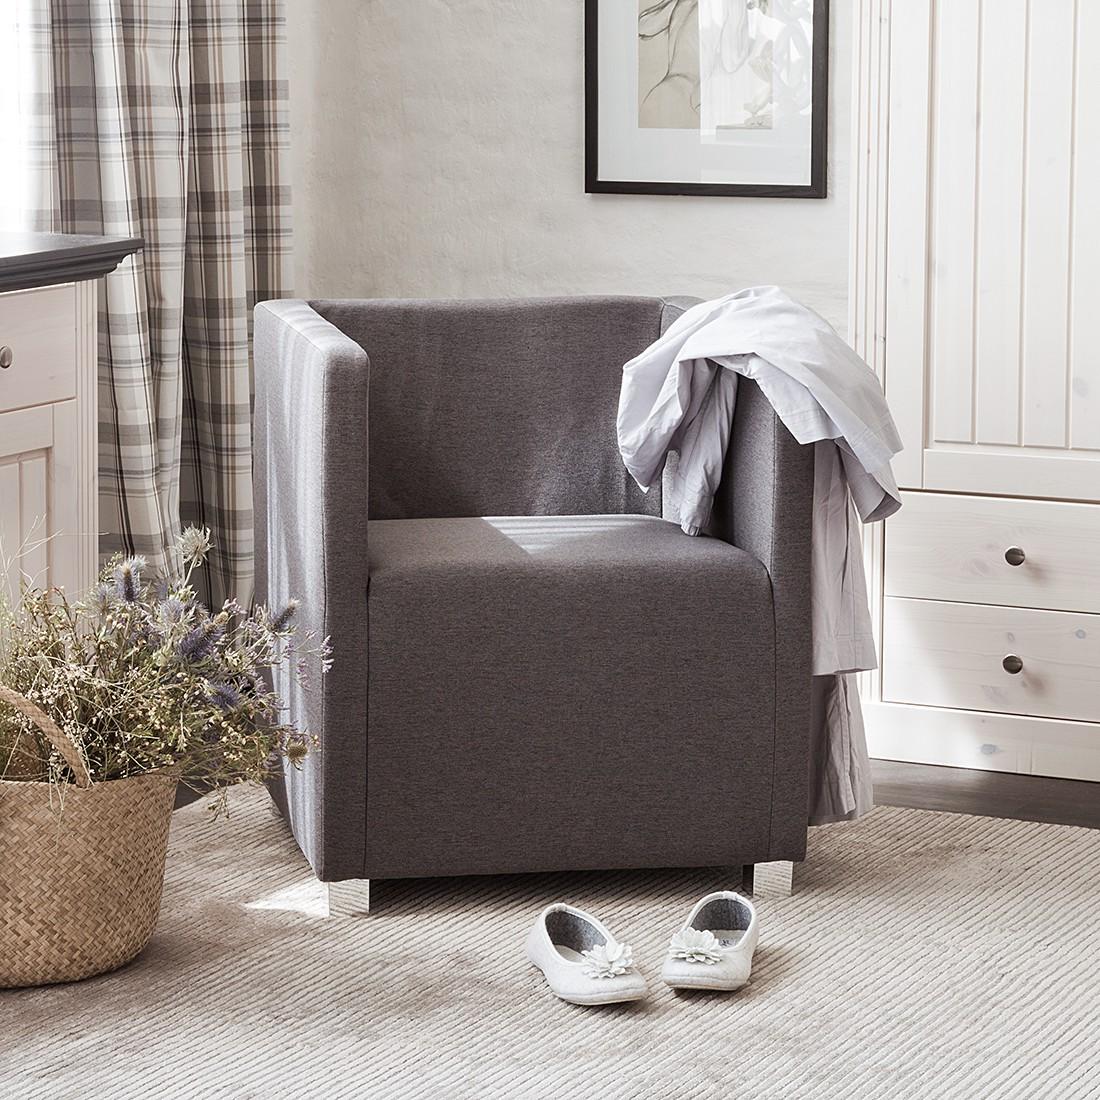 home24 mooved Sessel Carmen Grau Webstoff 63x71x64 cm (BxHxT)